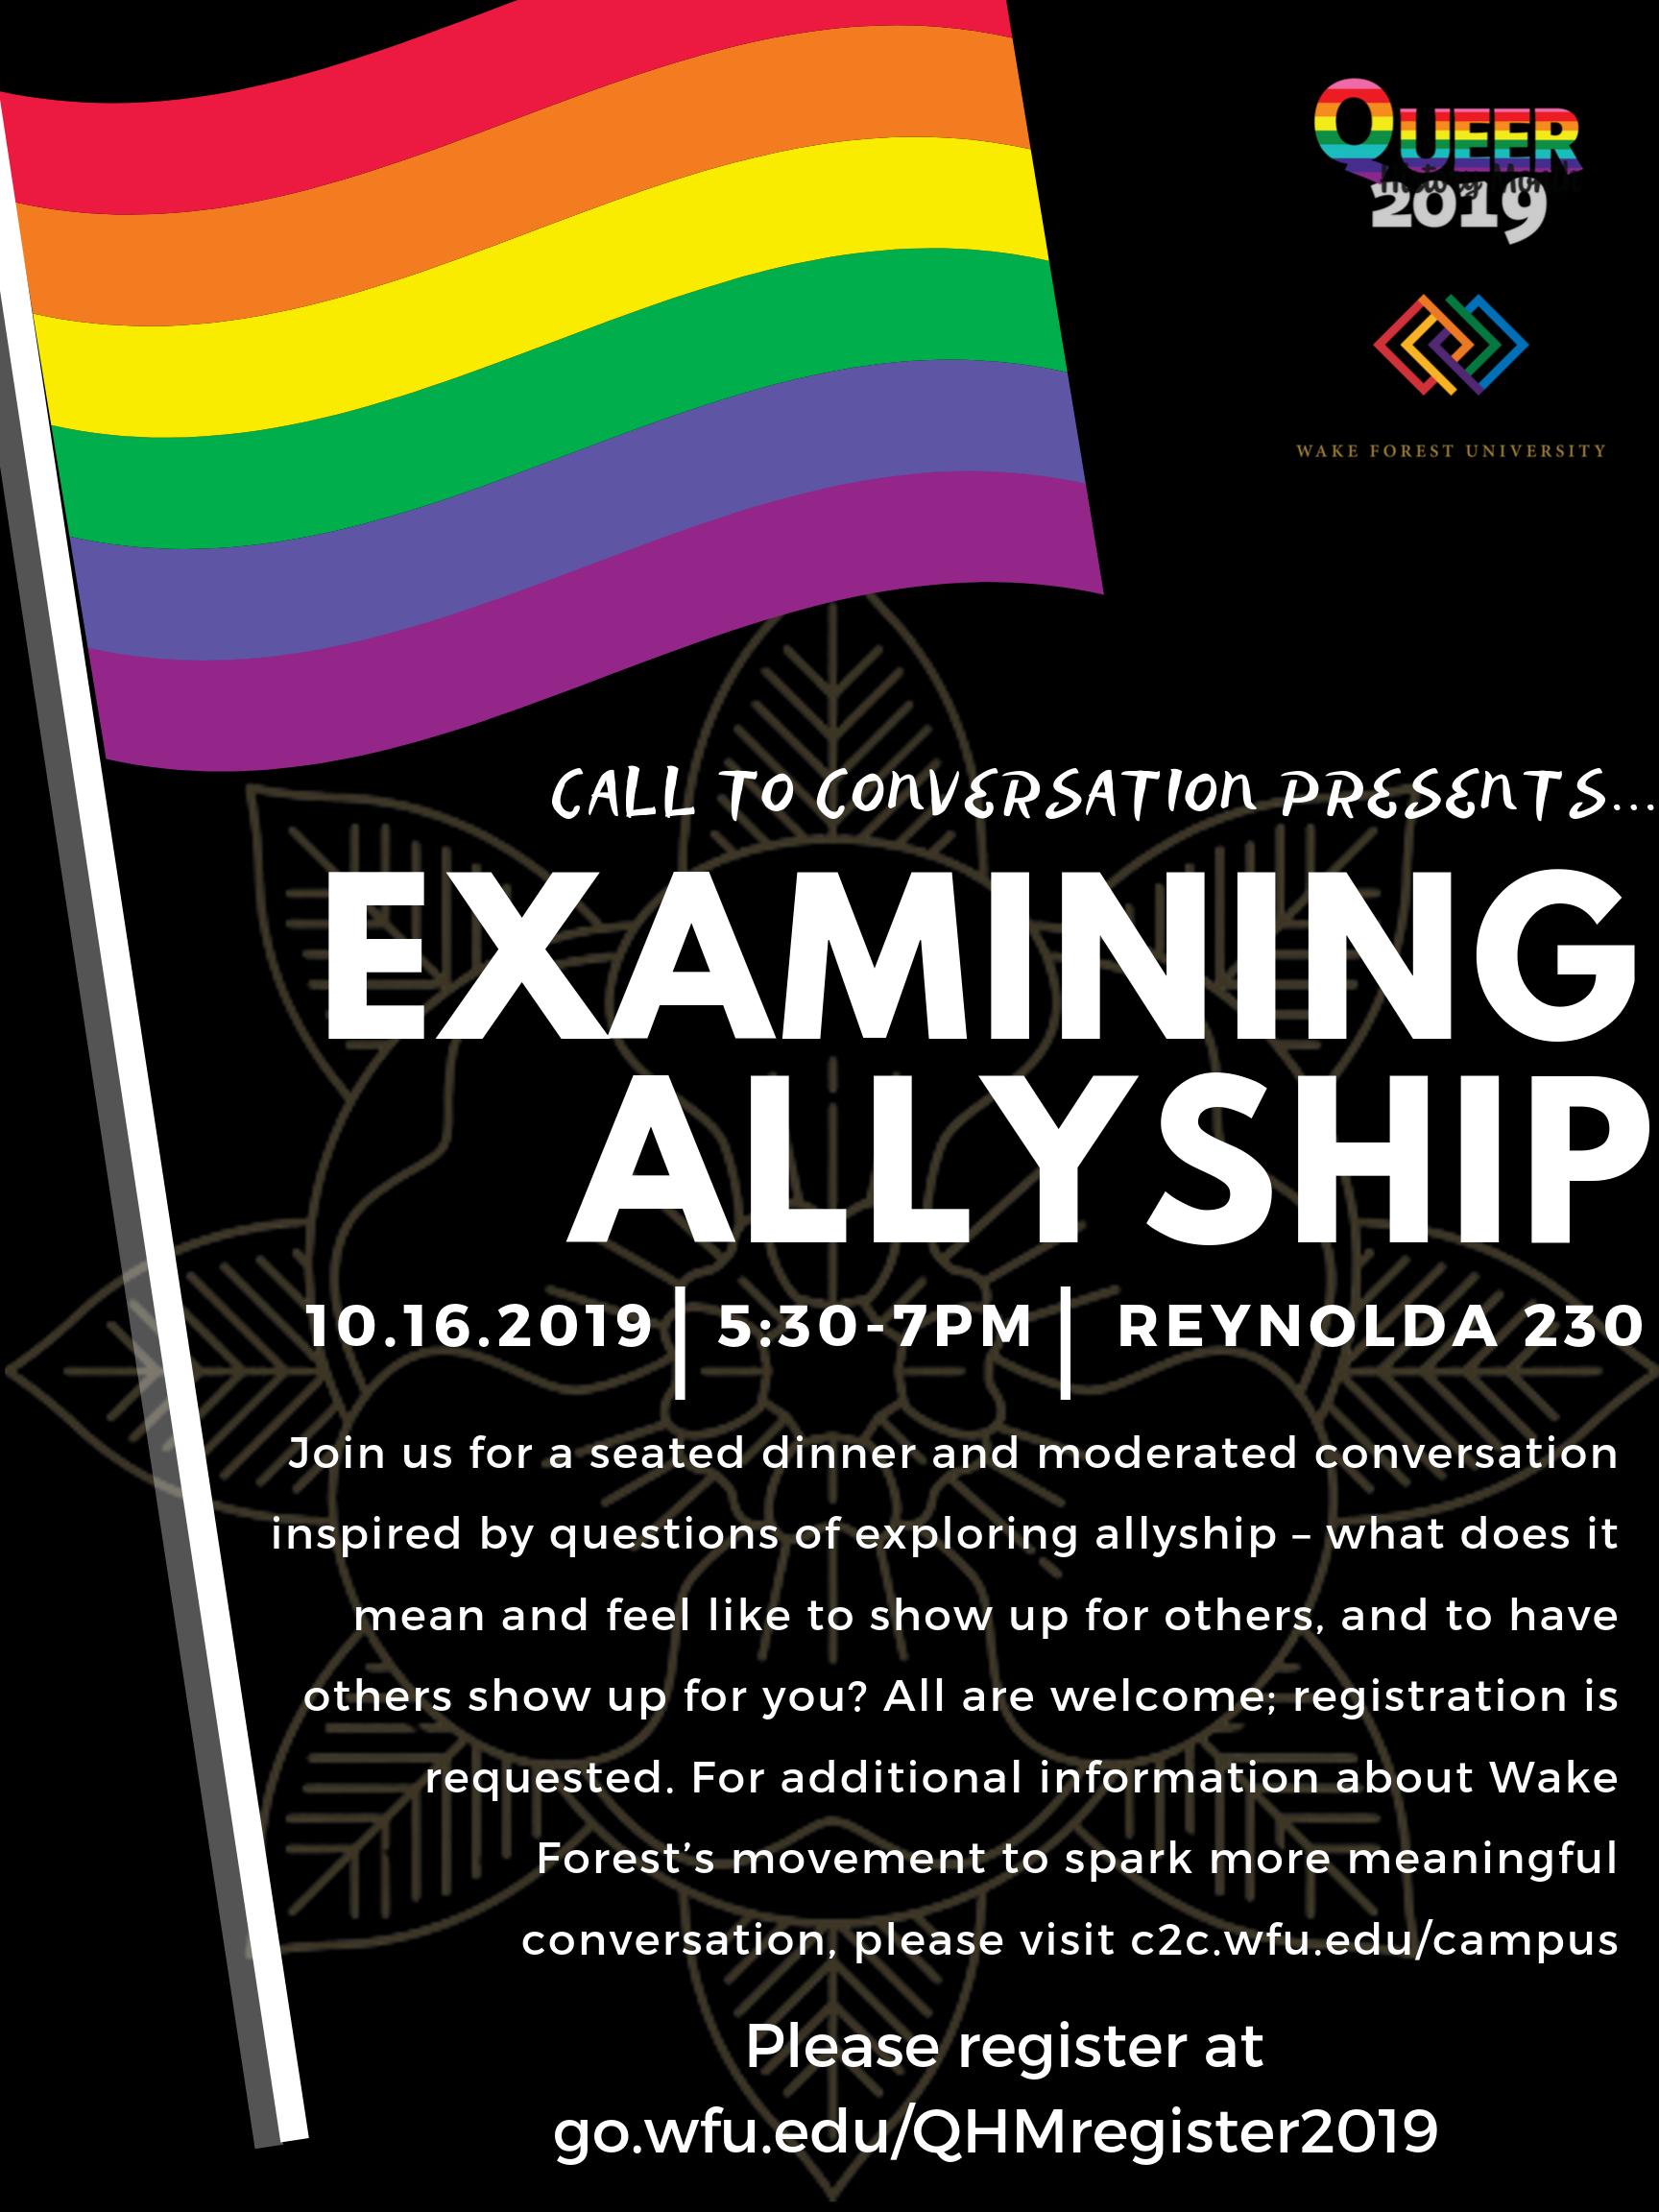 Flyer for Examining Allyship Call to Conversation held October 2019